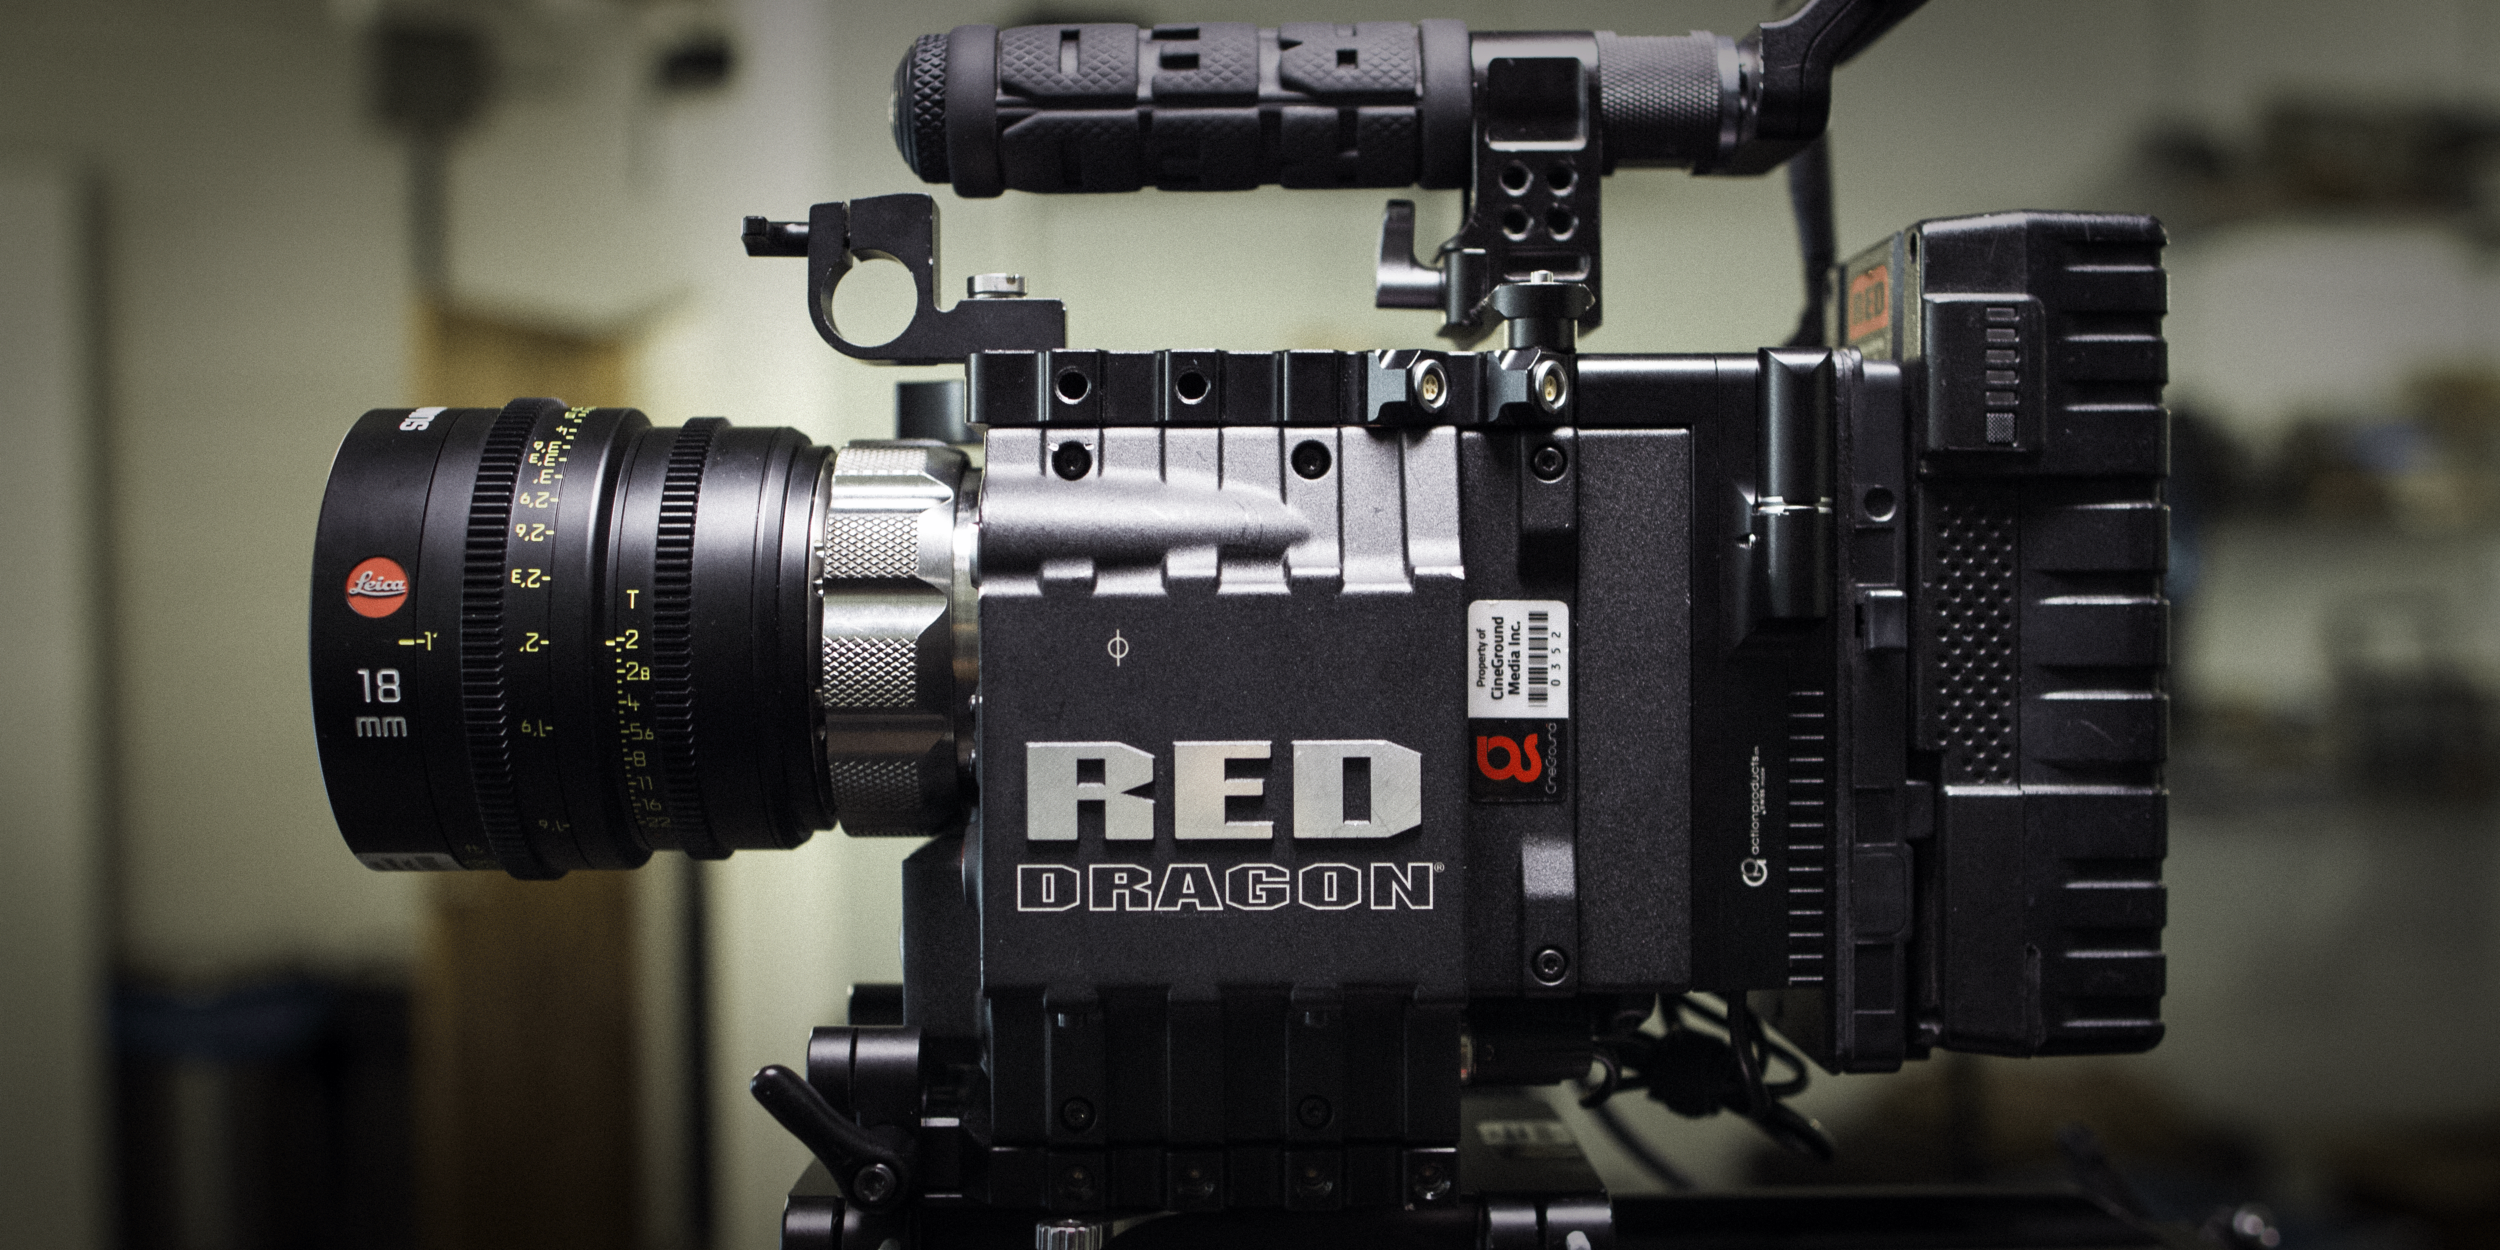 cineground-epic-dragon-camera-rental.png